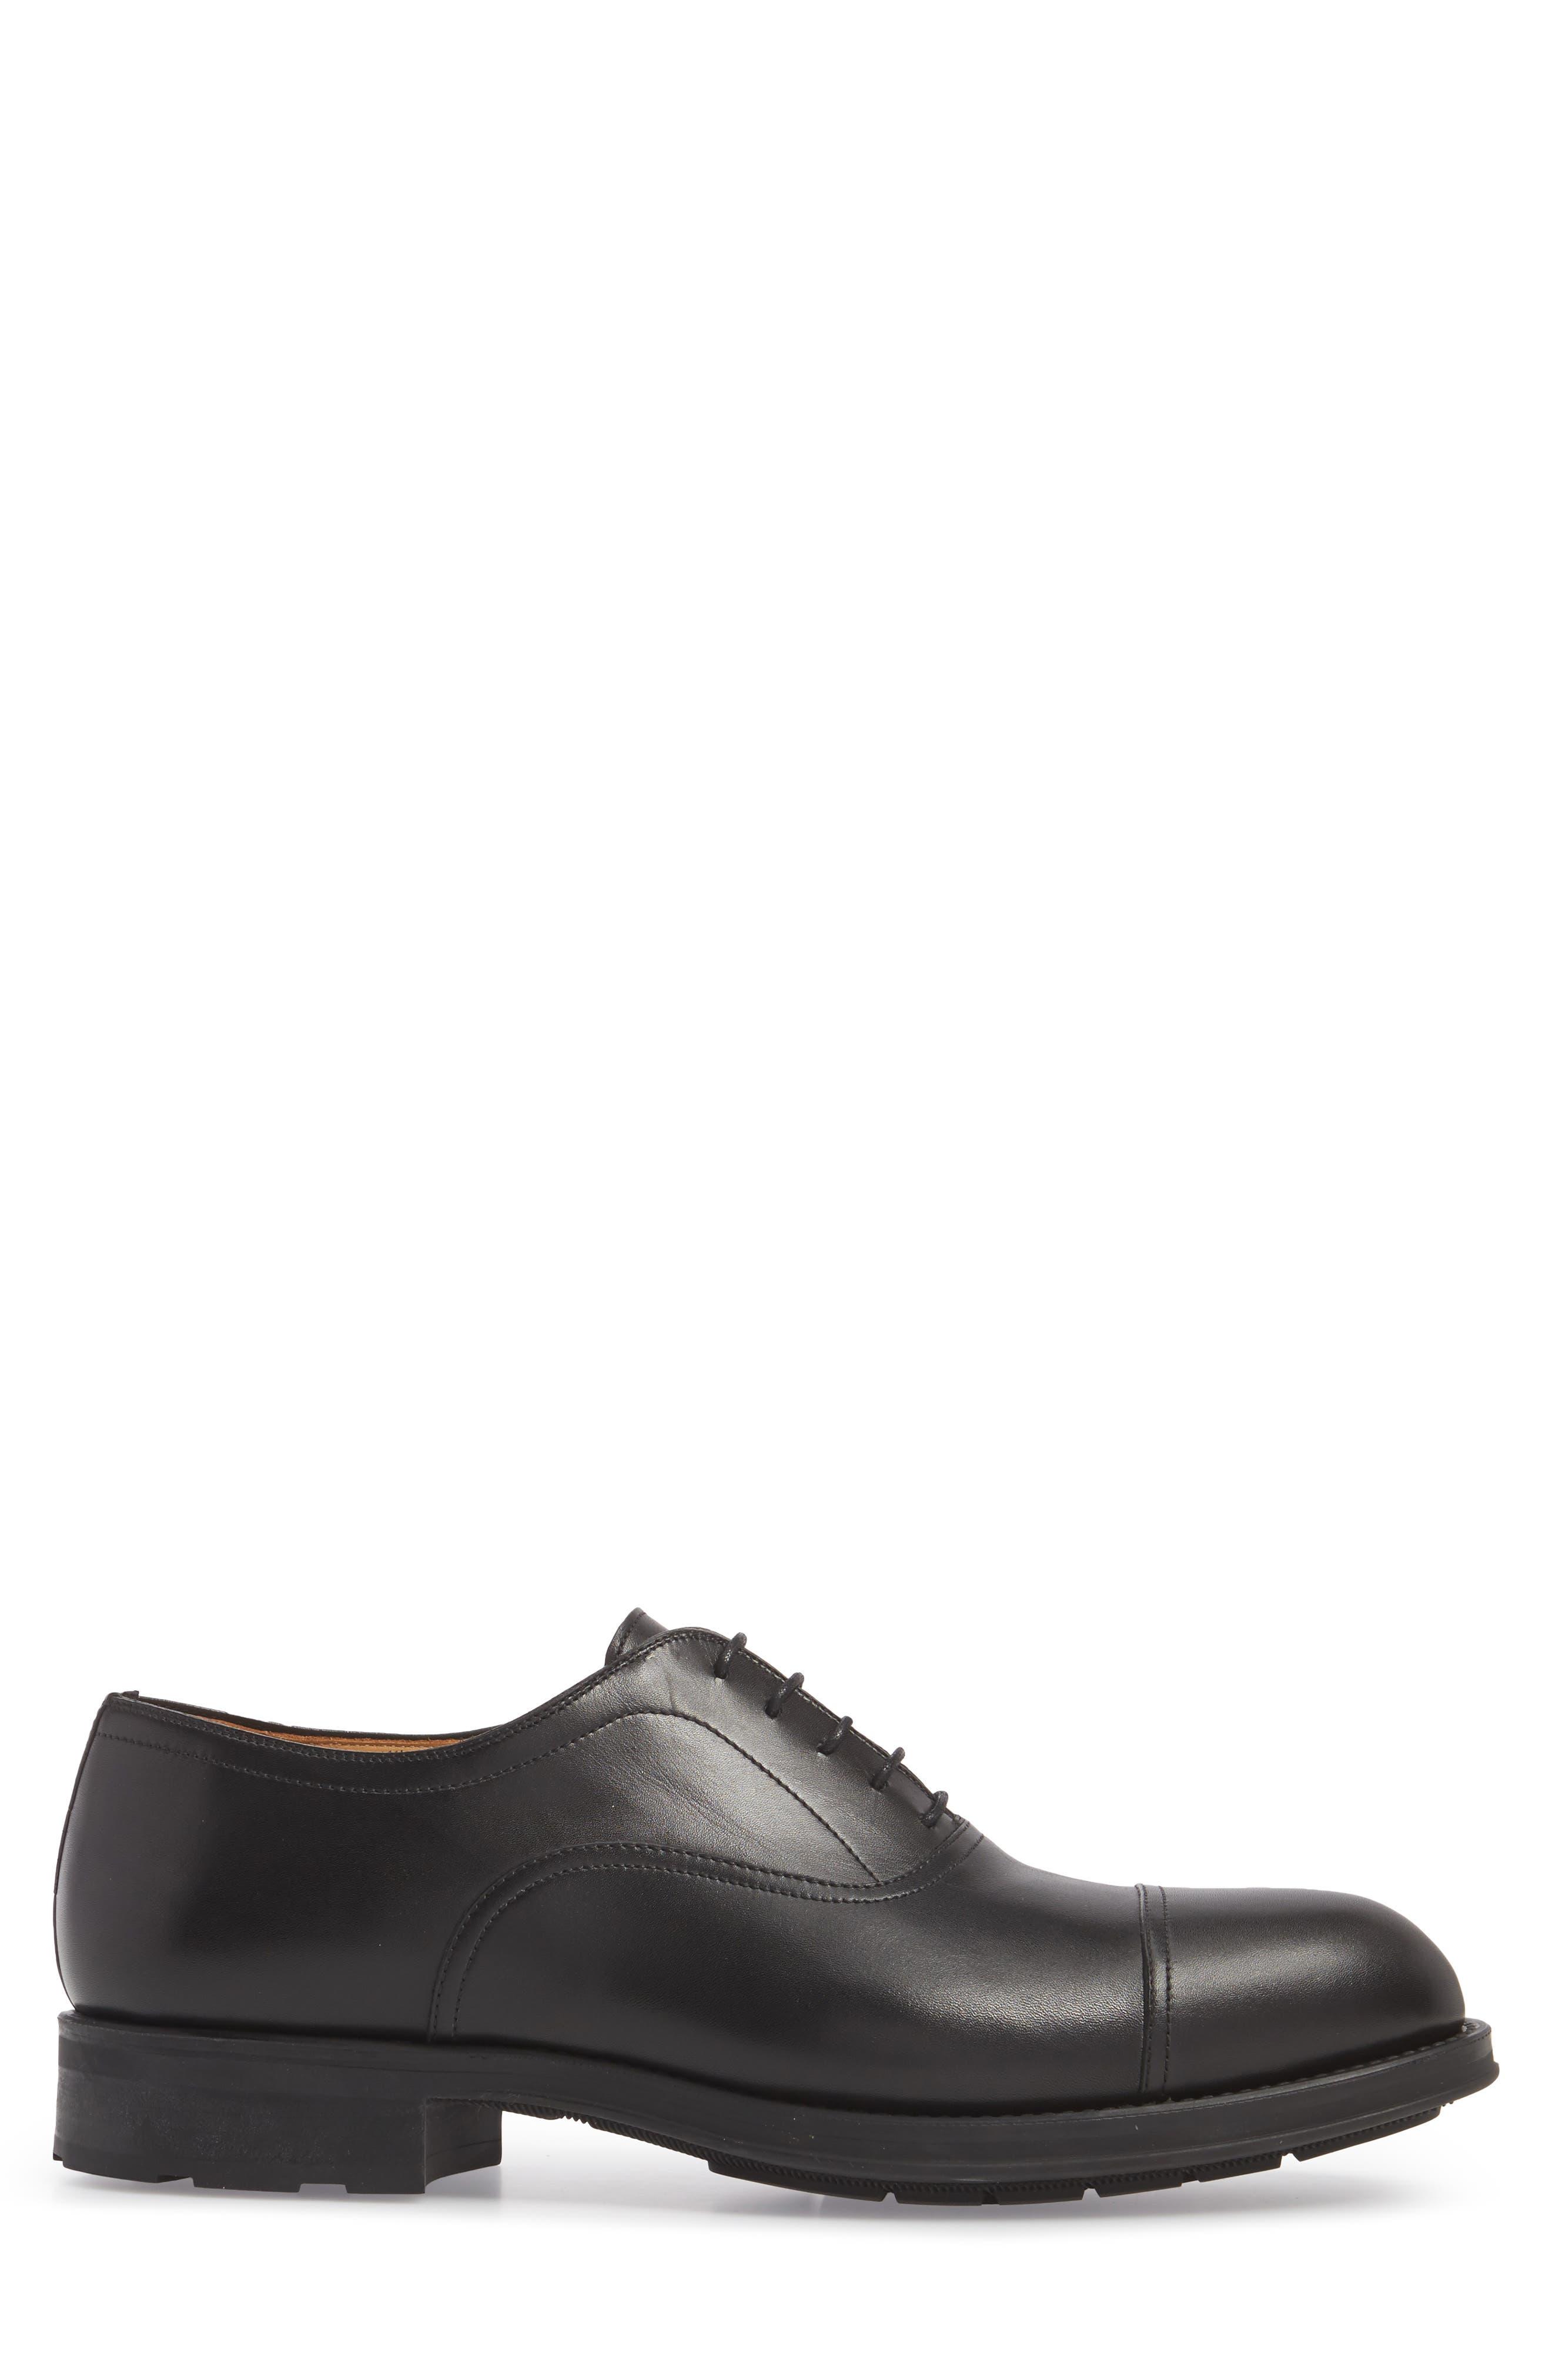 Tadeo Cap Toe Oxford,                             Alternate thumbnail 3, color,                             Black Leather